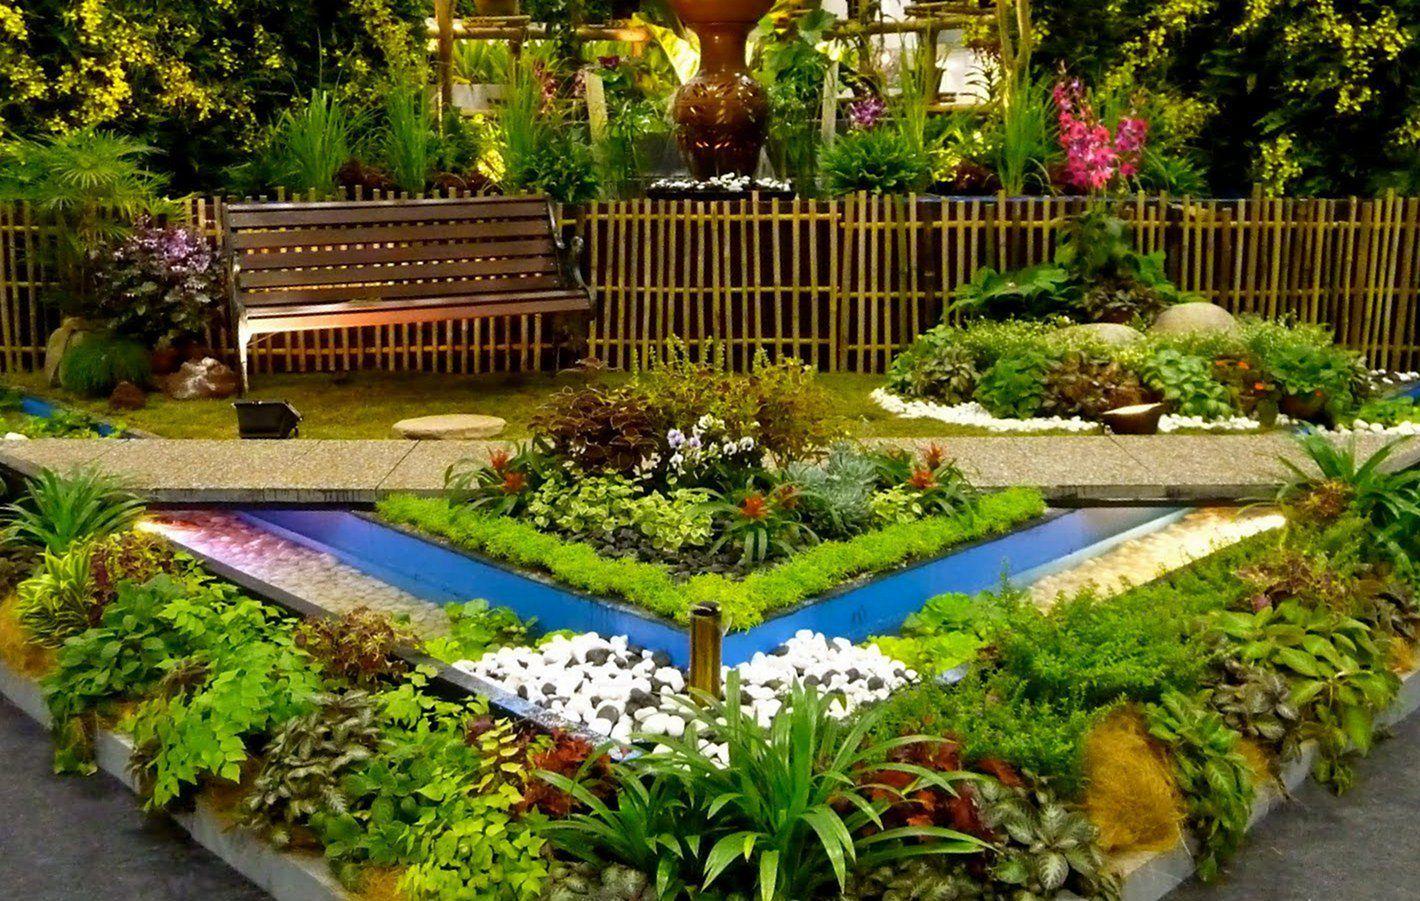 30 Awesome Flower Garden Design For Your Front Yard Teracee Small Backyard Gardens Garden Landscape Design Backyard Garden Landscape